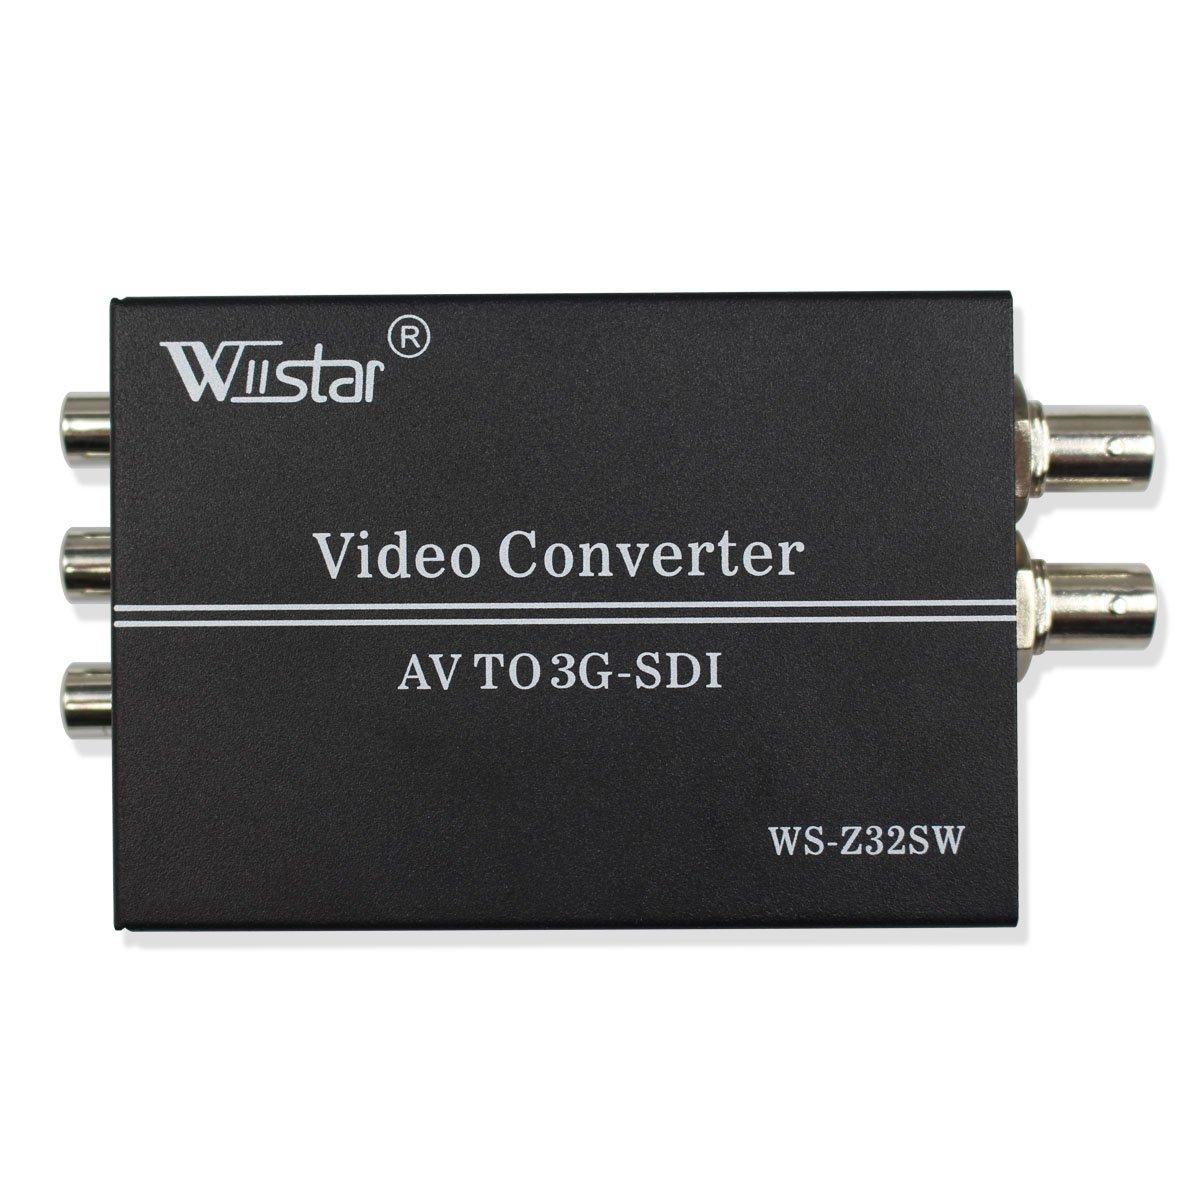 Wiistar AV CVBS to 3G-SDI Audio Video Converter Composite to SDI Converter Support 1080P for CRT HDTV to Camera by Wiistar (Image #2)